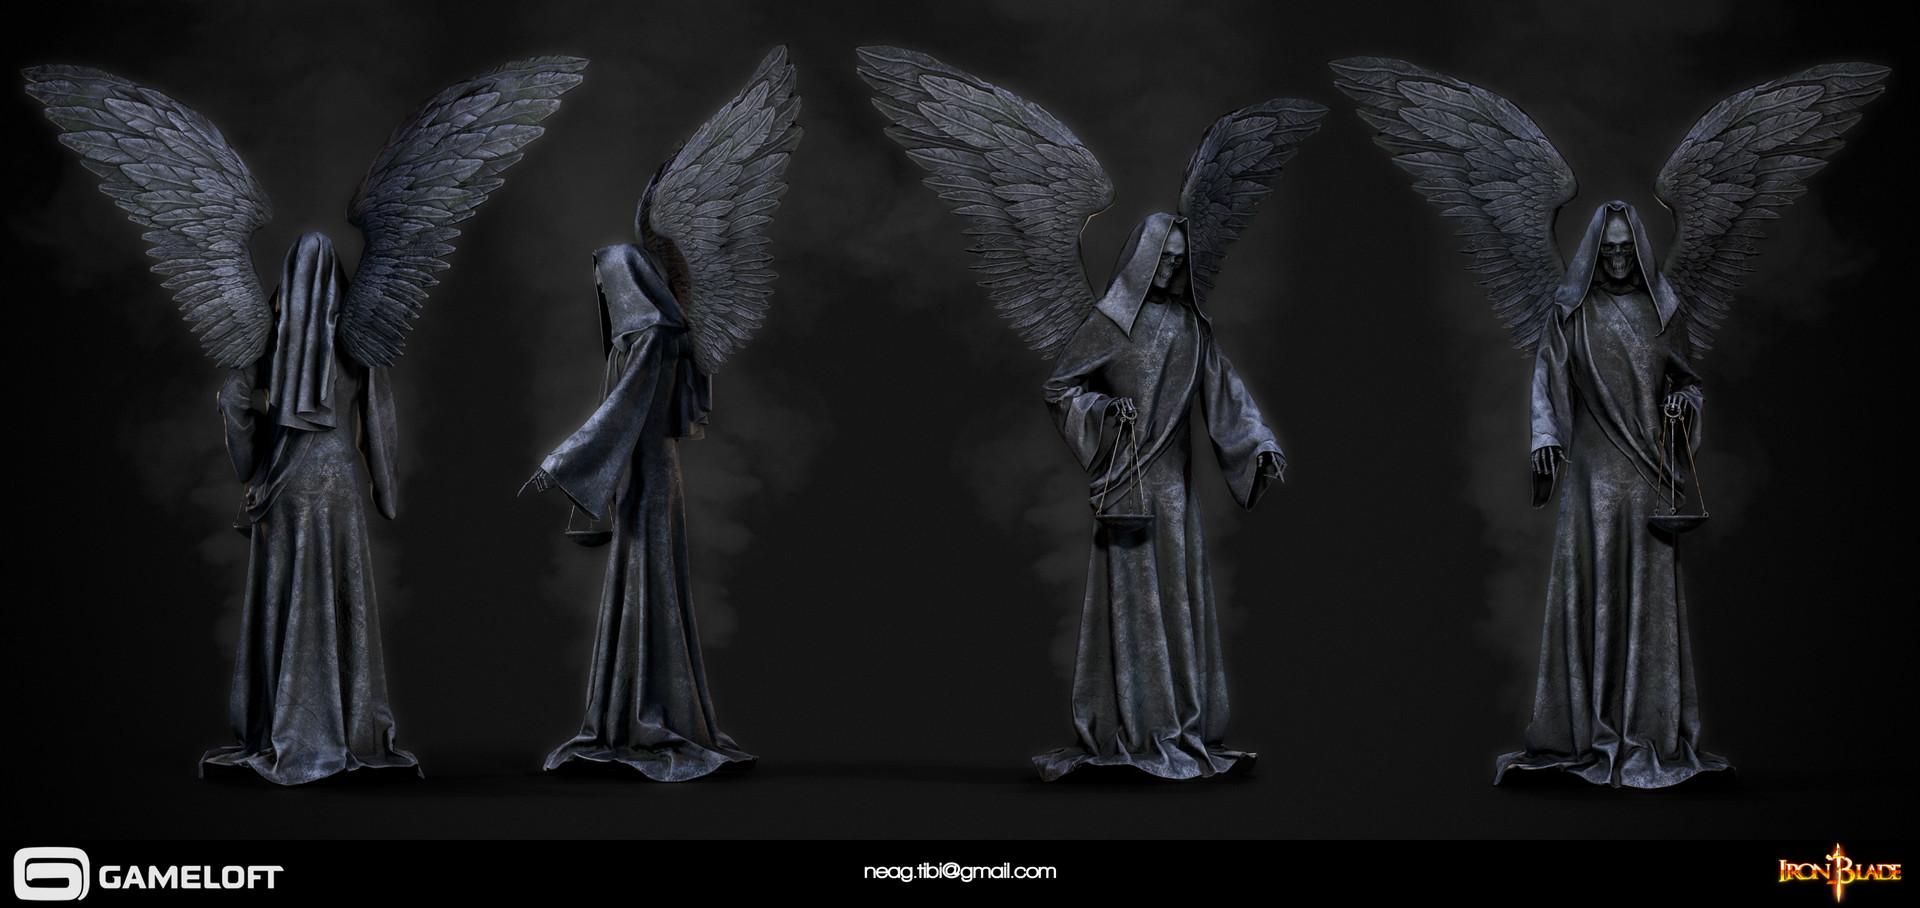 Tibi neag tibi neag iron blade death statue low poly resize